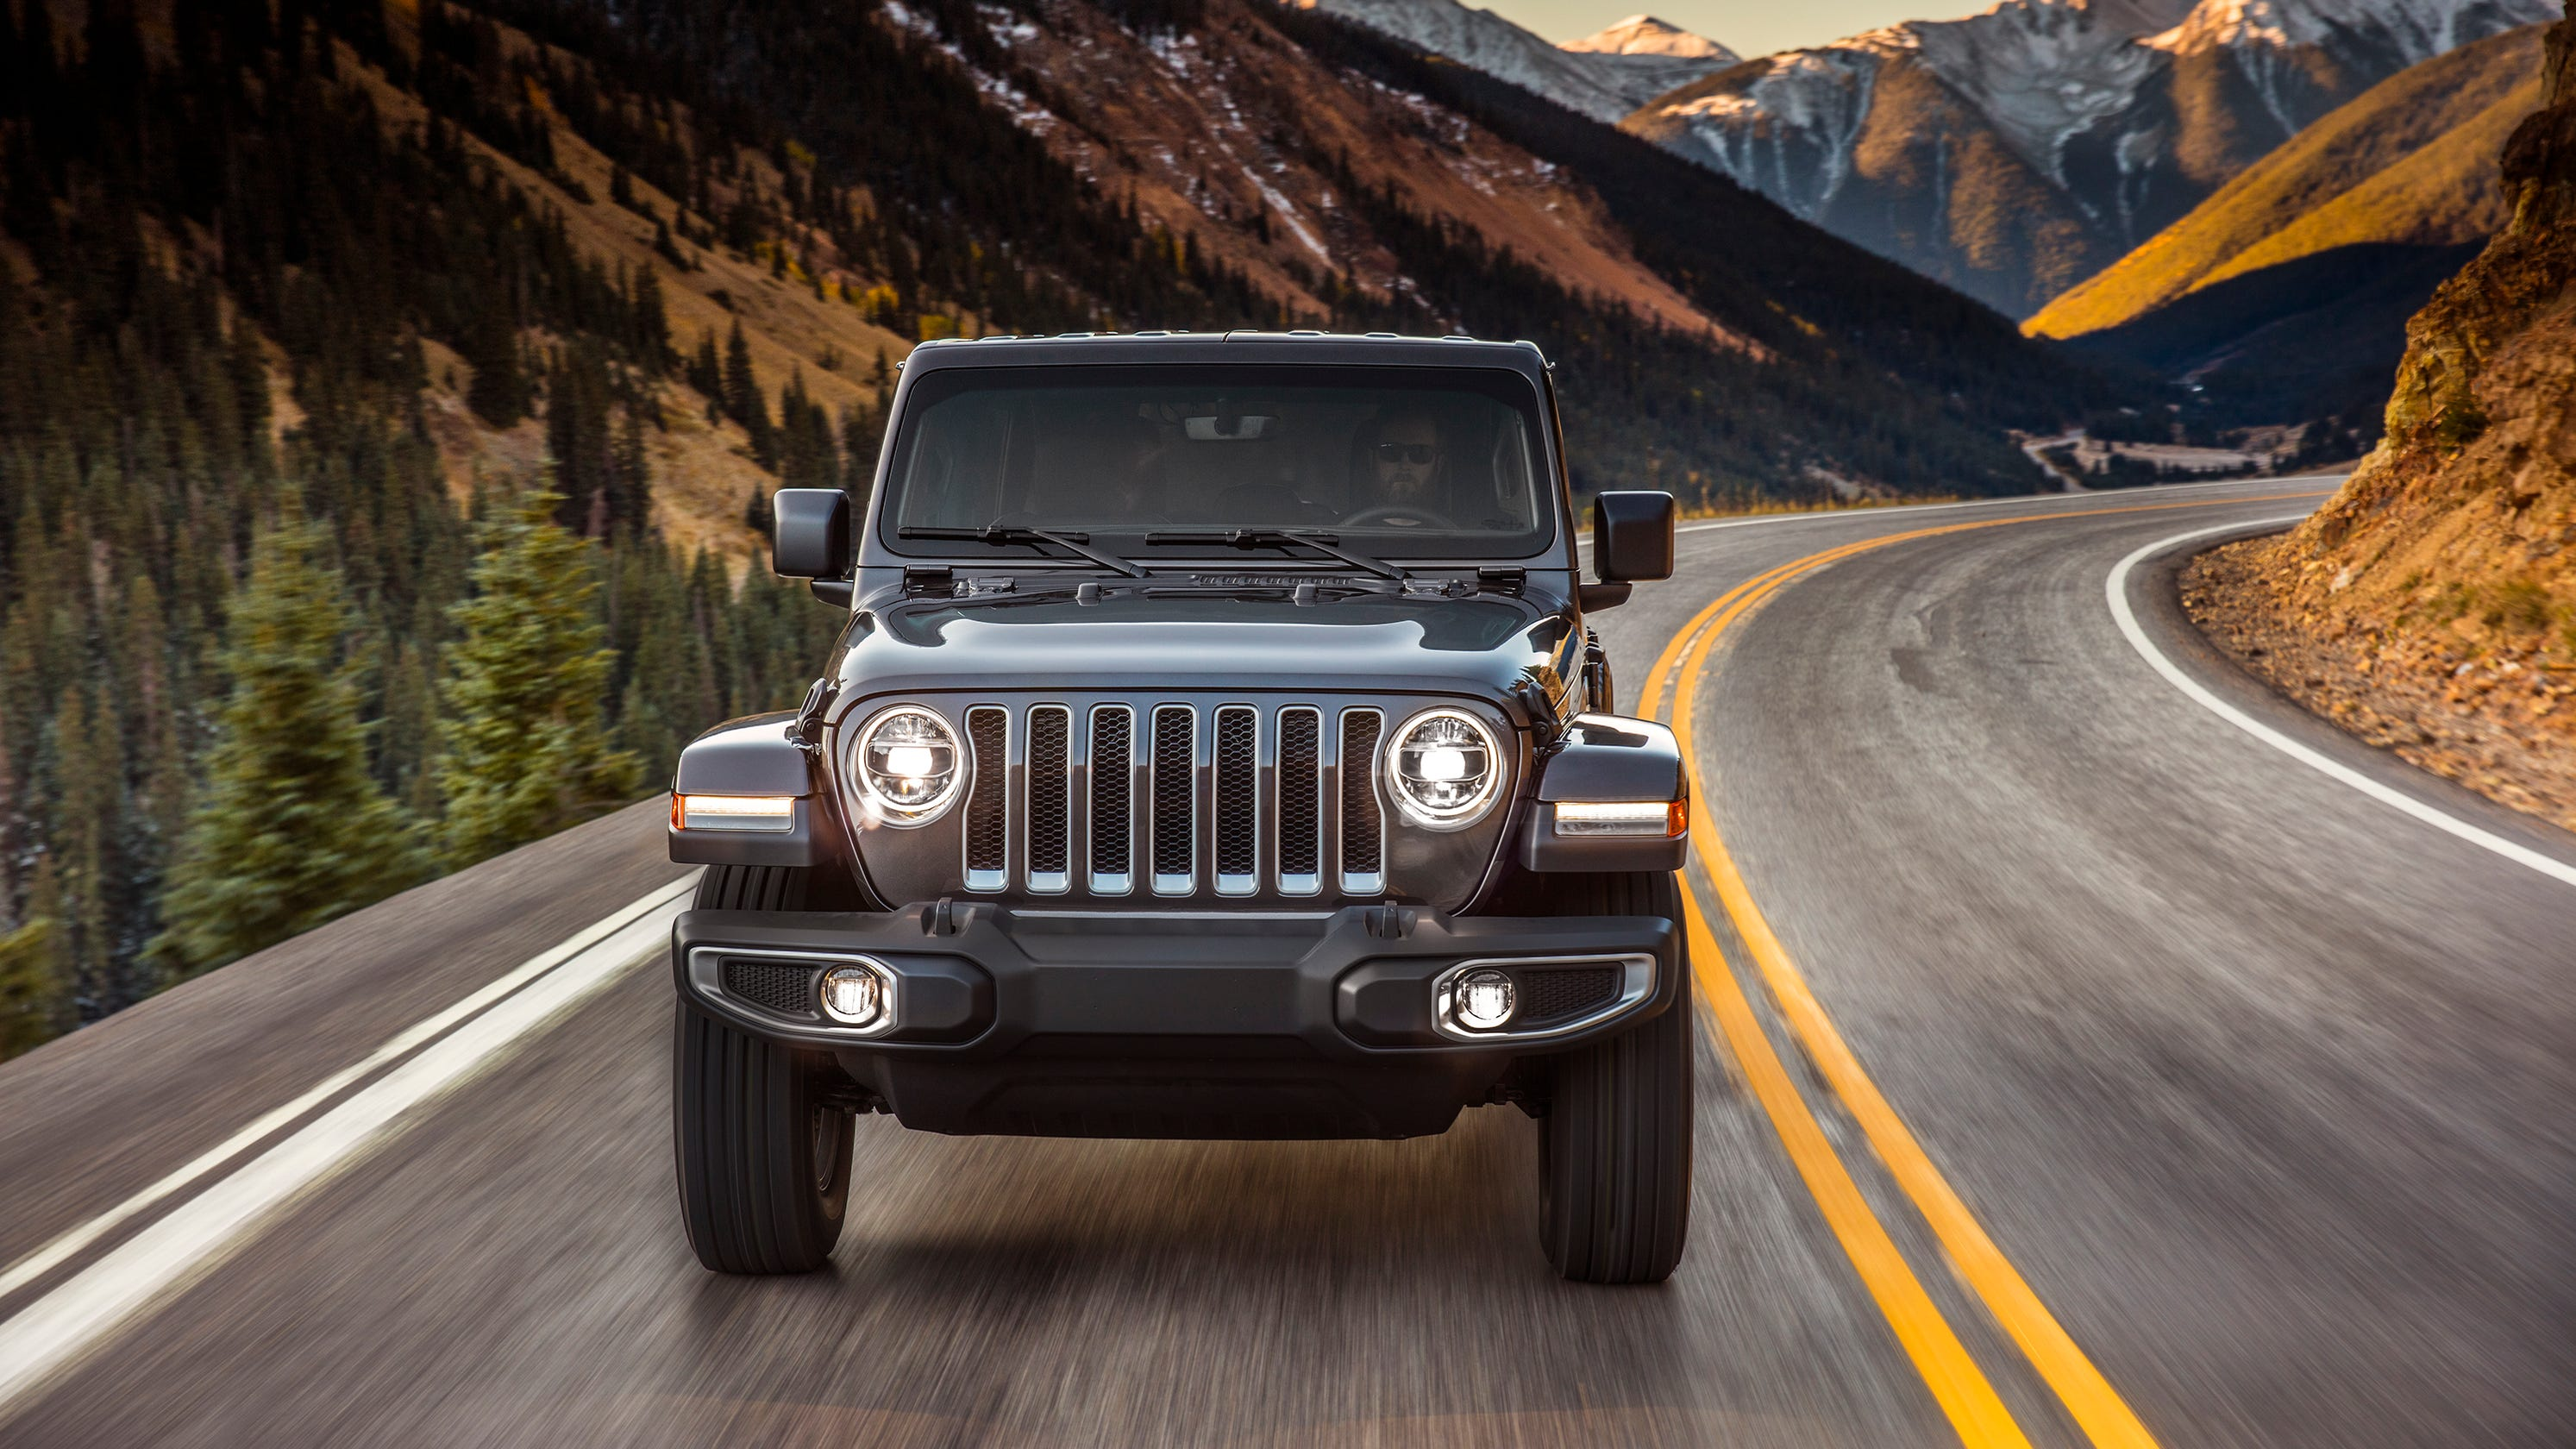 Death Wobble Jeep >> Fiat Chrysler sued over alleged Jeep Wrangler 'death wobble'